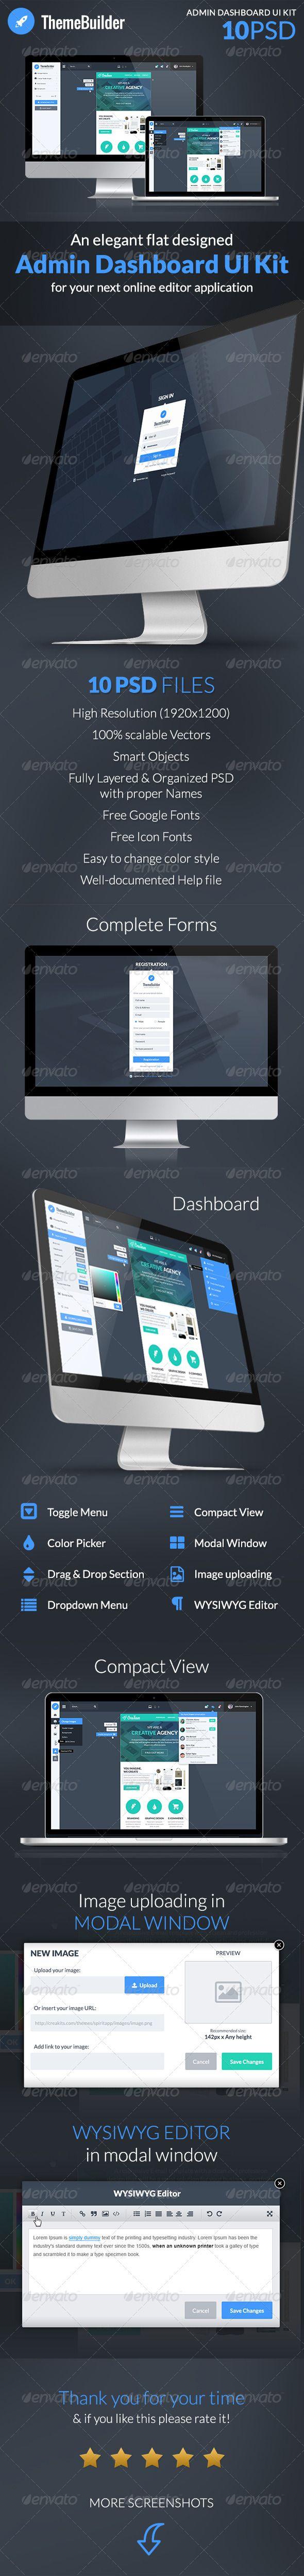 ThemeBuilder - Admin Dashboard UI Kit